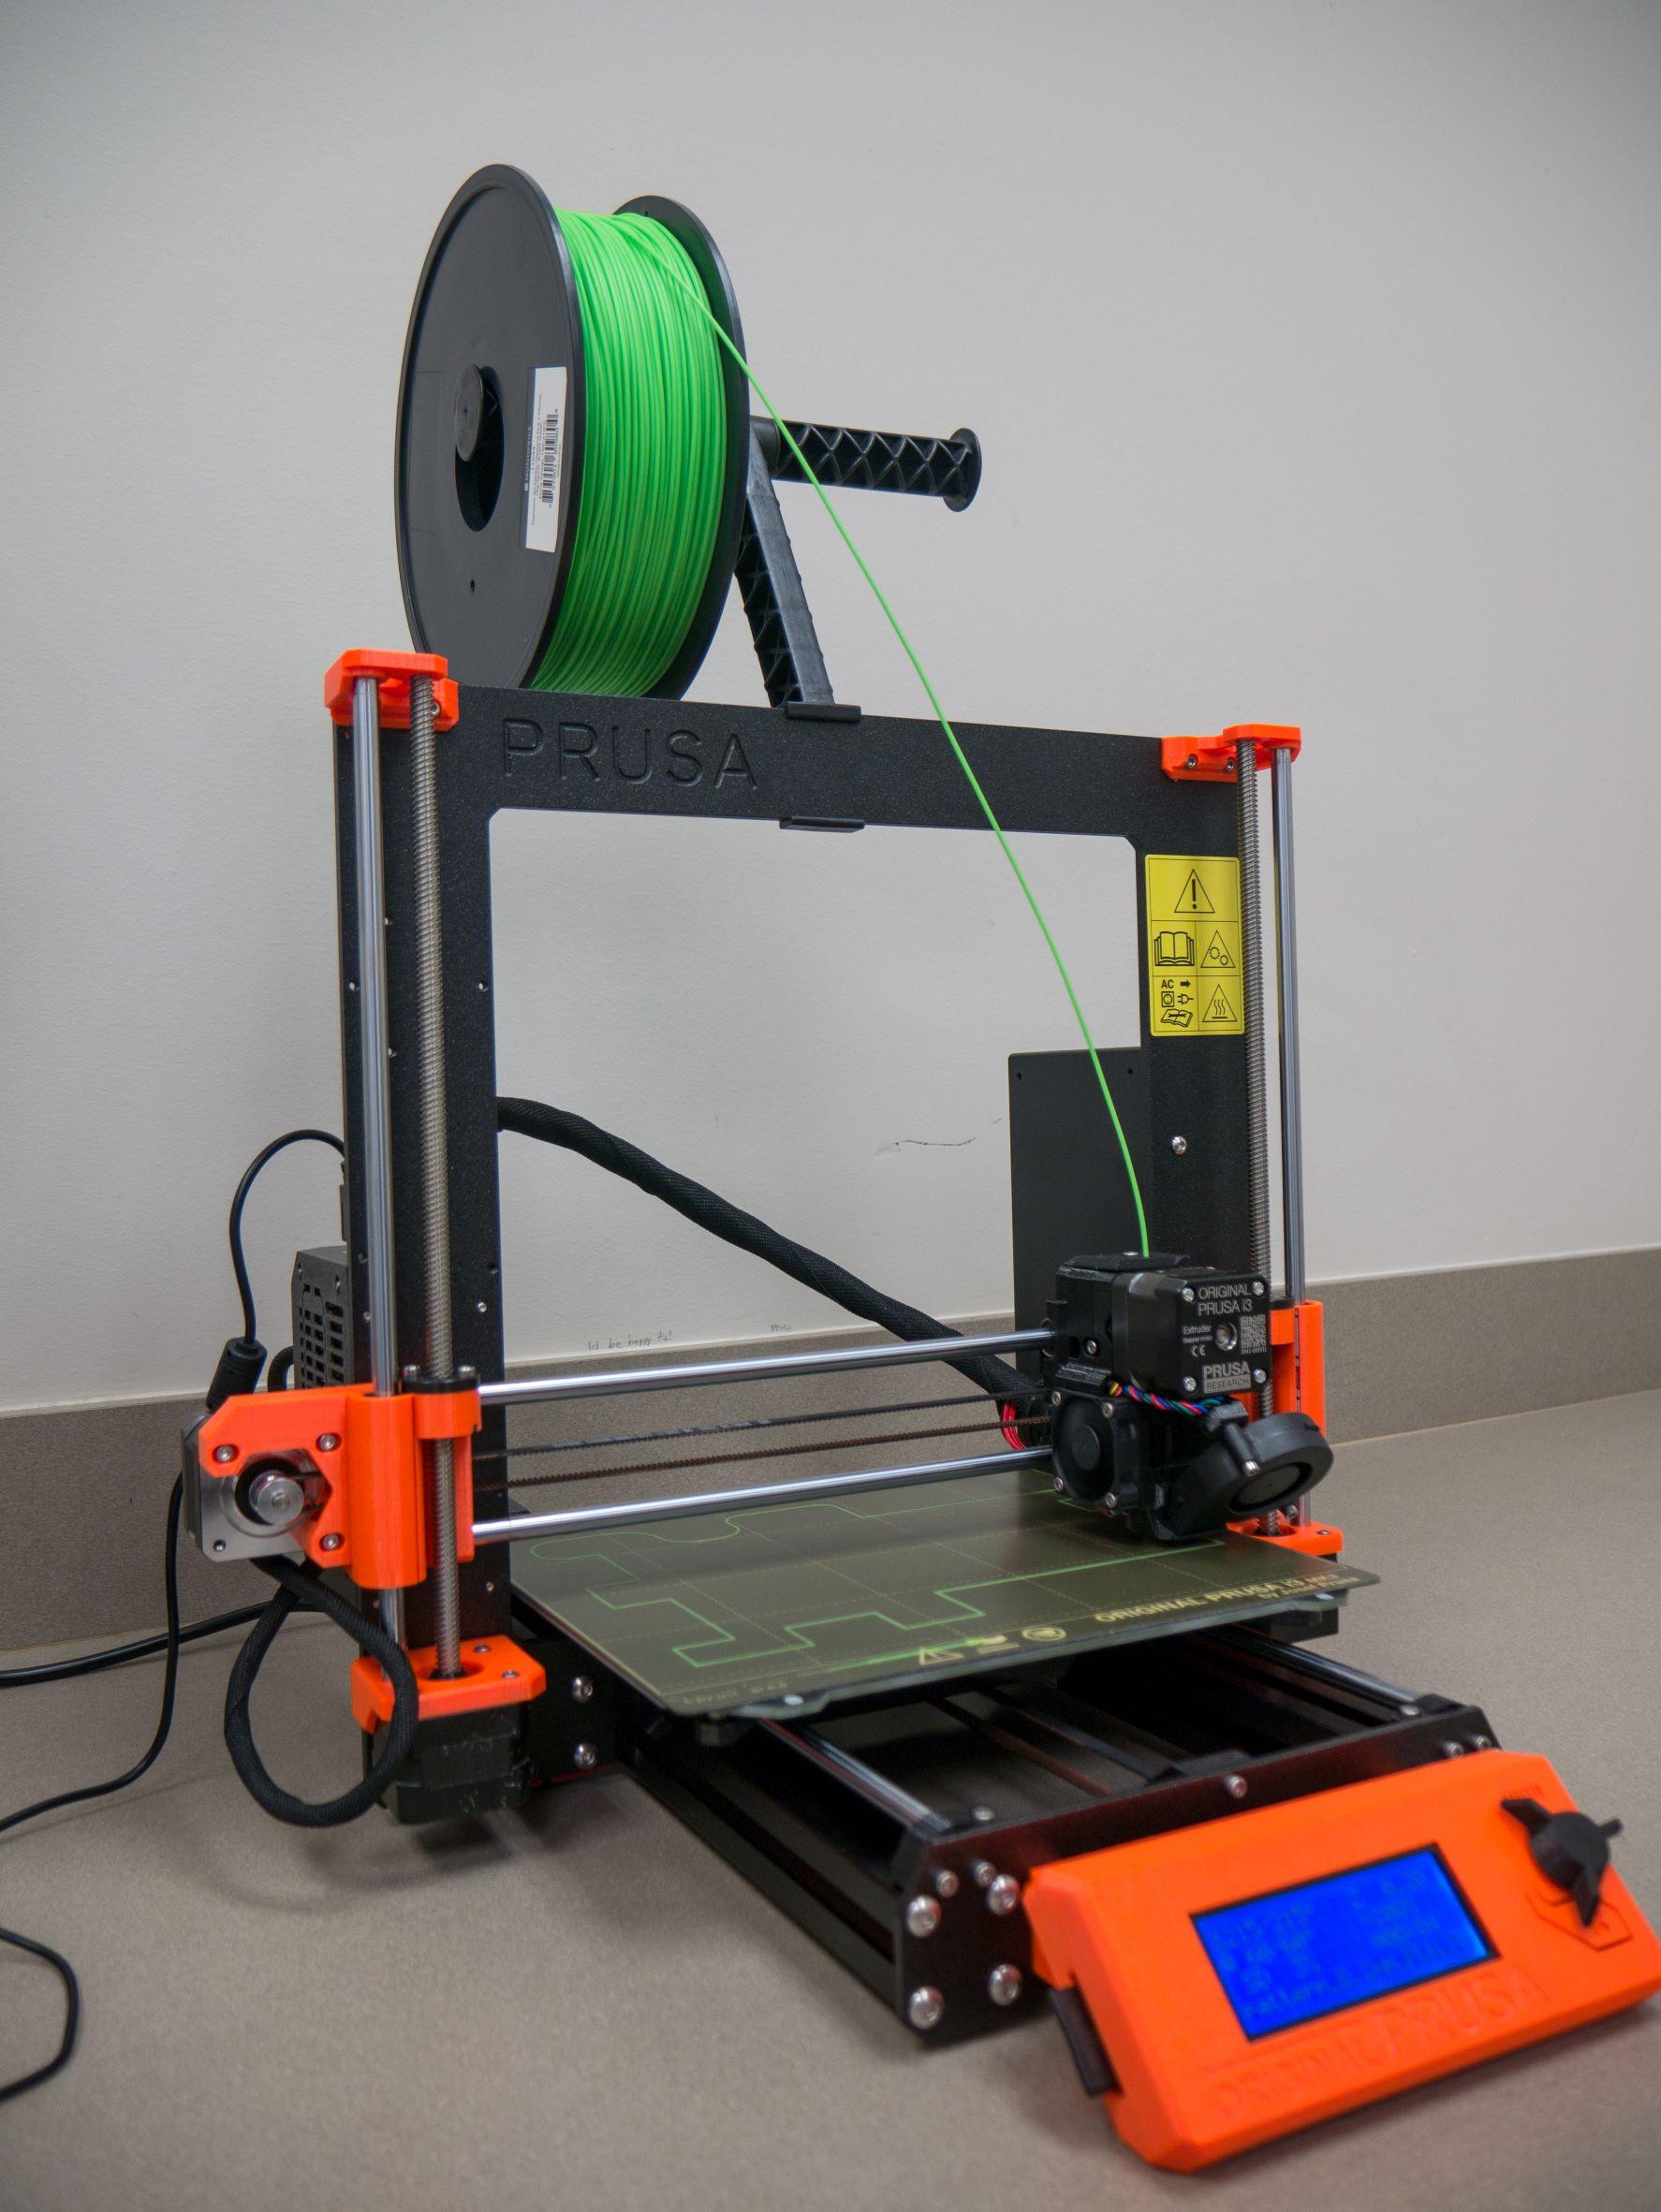 Prusa 3D Printere